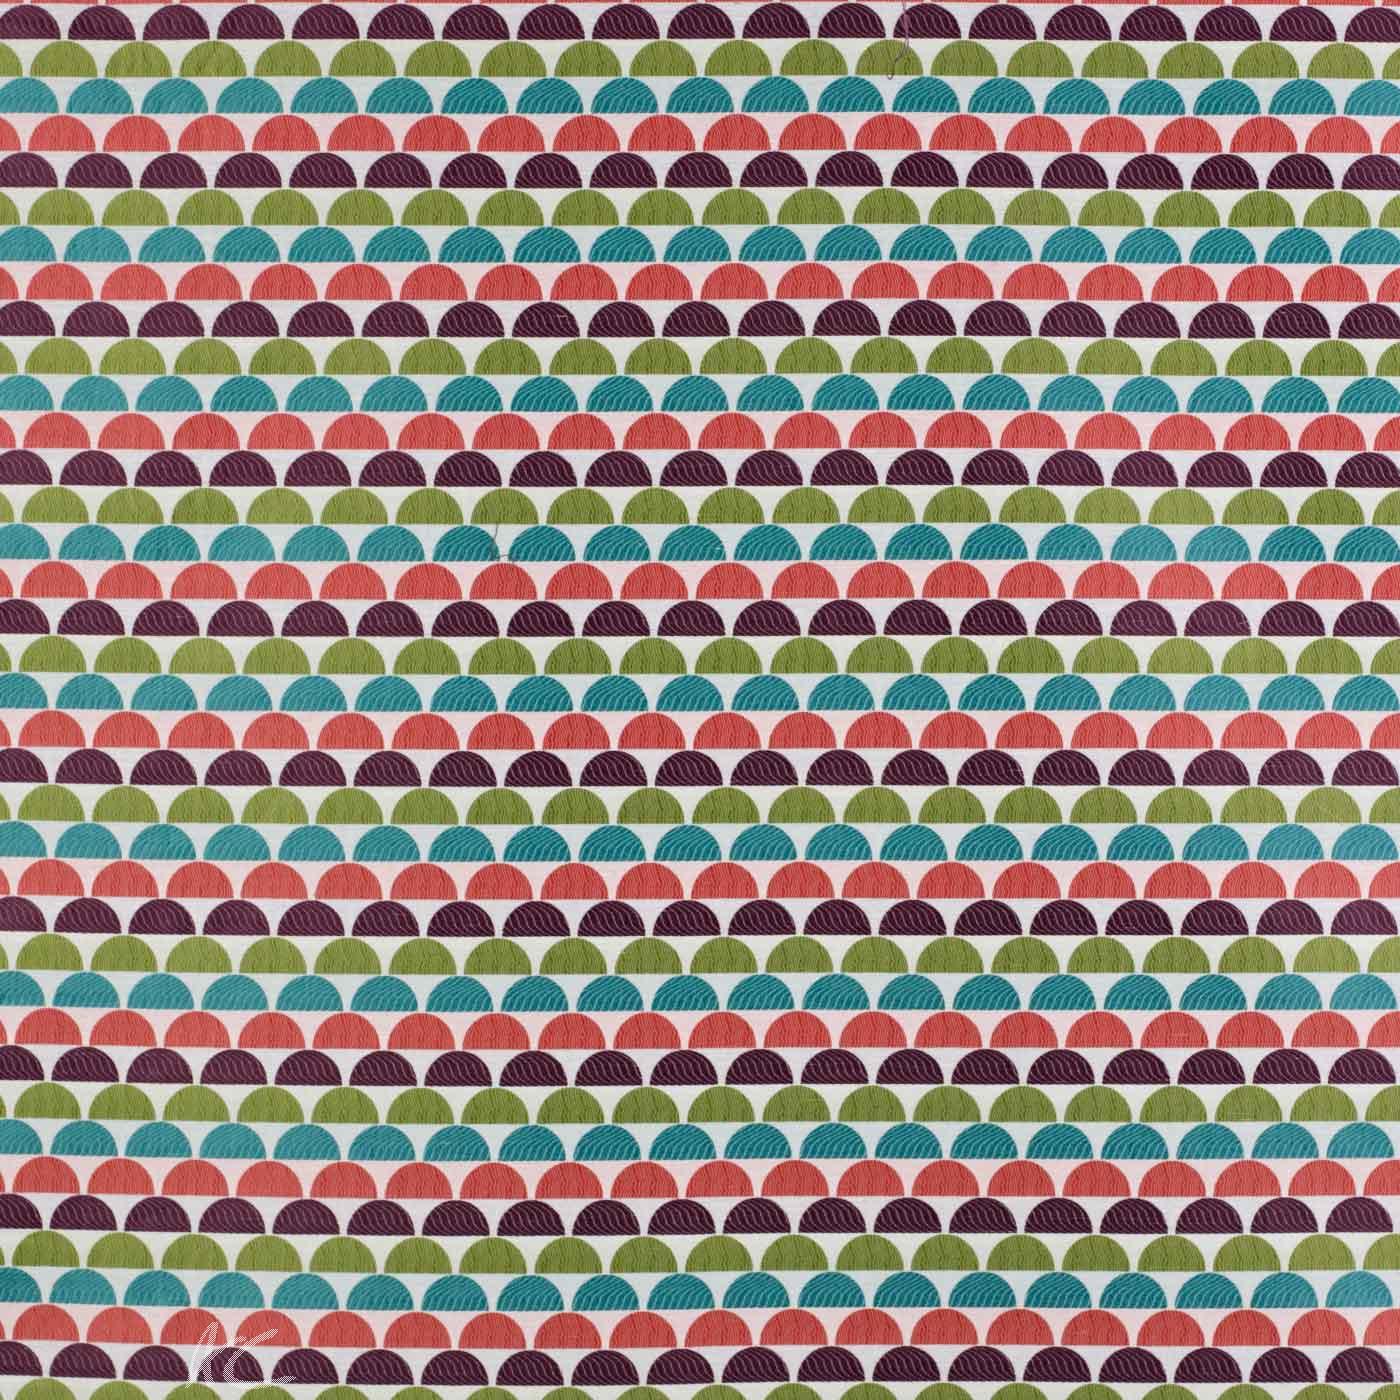 Prestigious Textiles Annika Ulrika TuttiFrutti Curtain Fabric